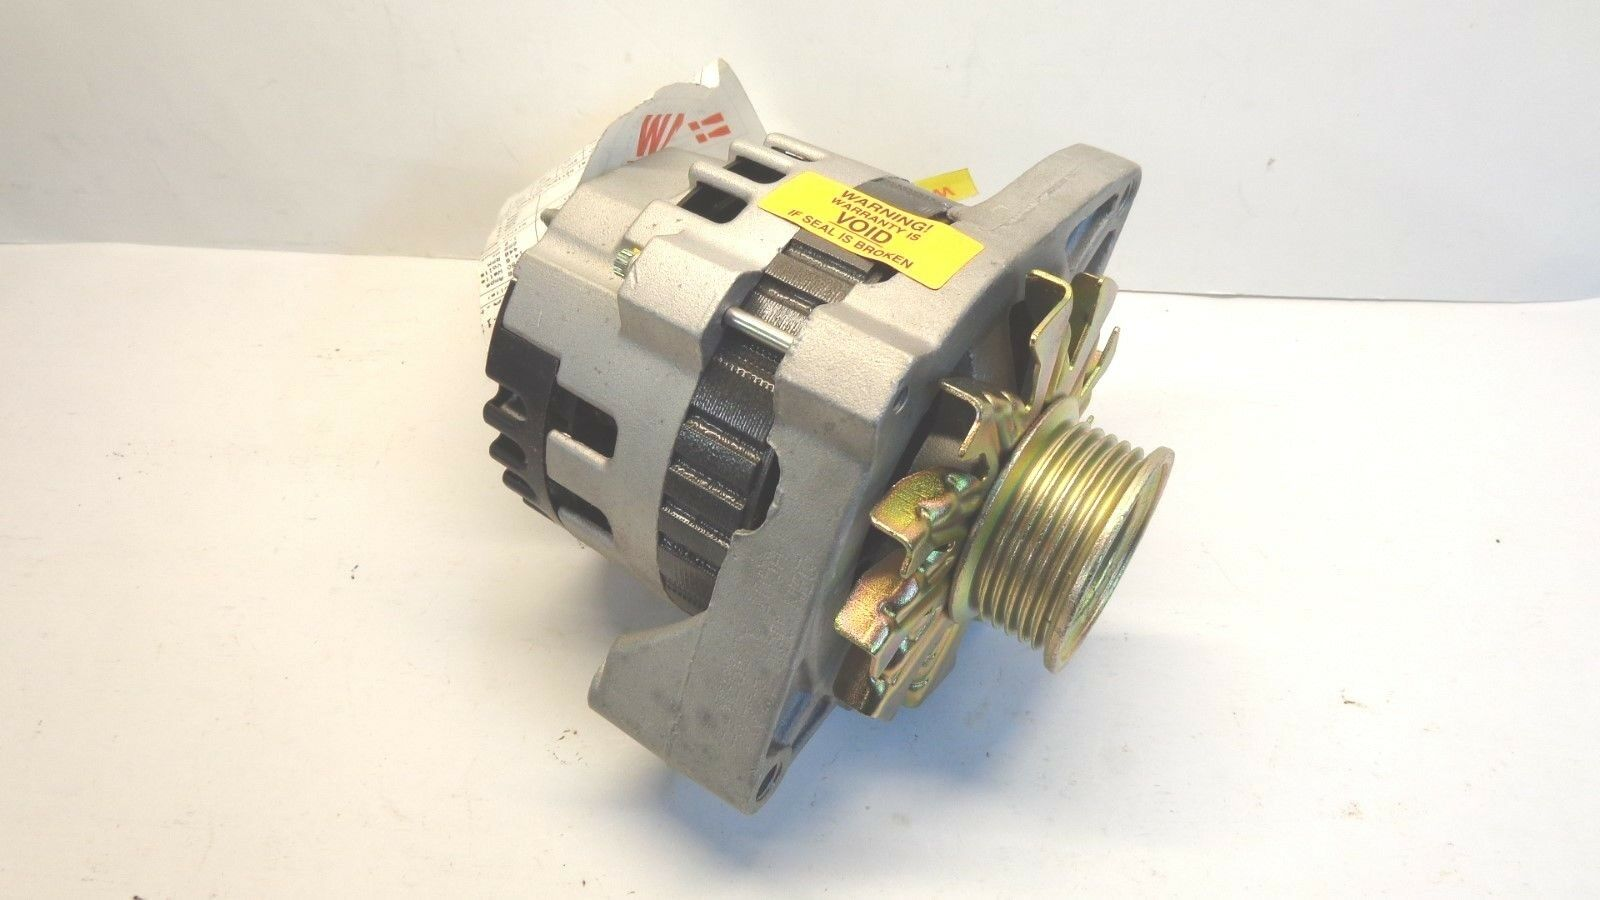 hight resolution of new reman alternator gm 3 8 3 8l regal 91 92 93 94 95 park ave 98 delta 88 91 for sale